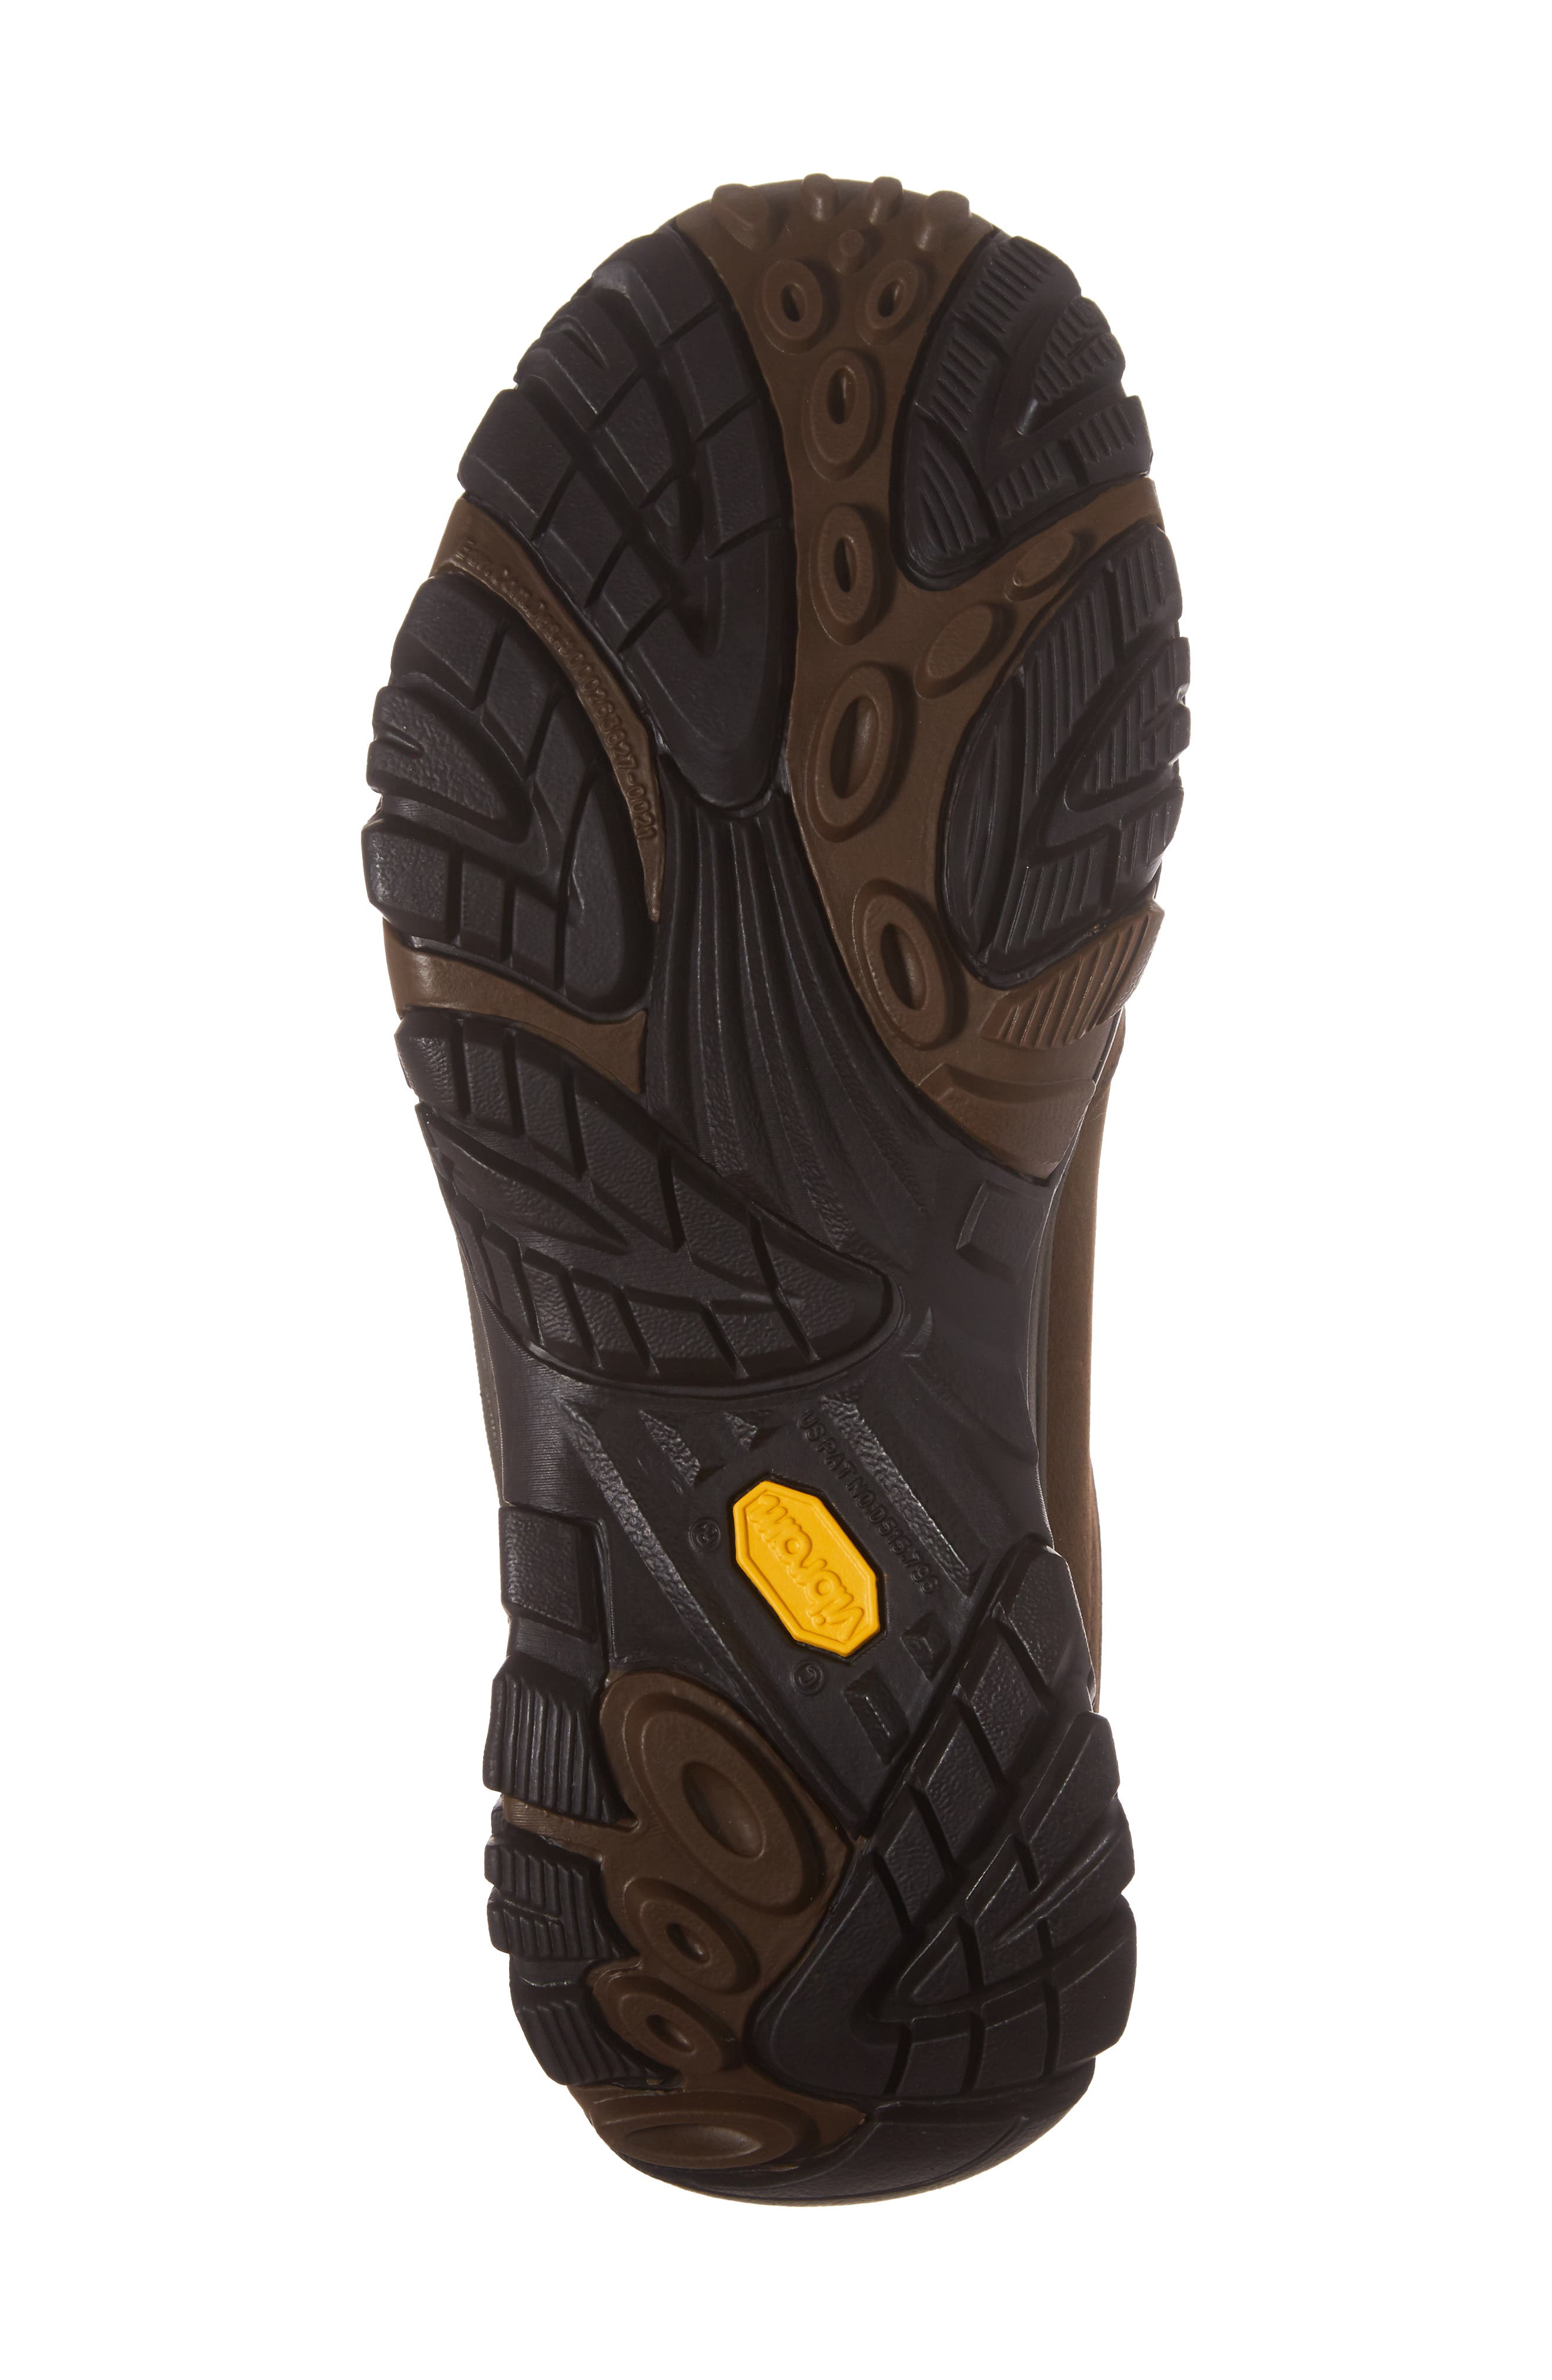 Moab Adventure Hiking Shoe,                             Alternate thumbnail 6, color,                             Dark Earth Nubuck Leather